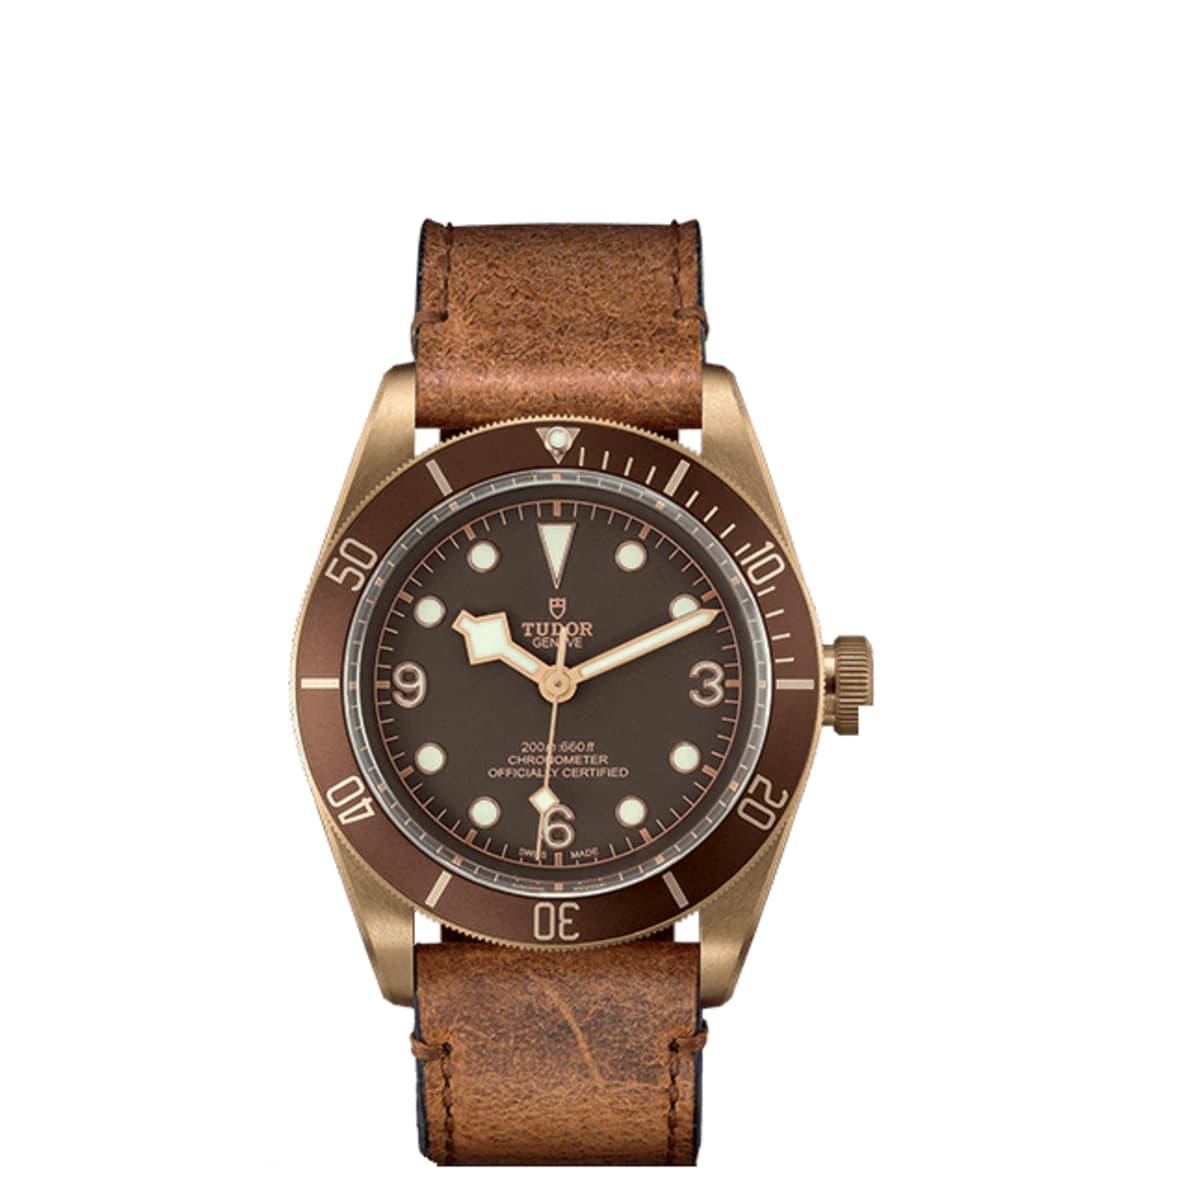 Tudor Black Bay Bronze Leather Strap Watch £2,333 @ David M Robinson